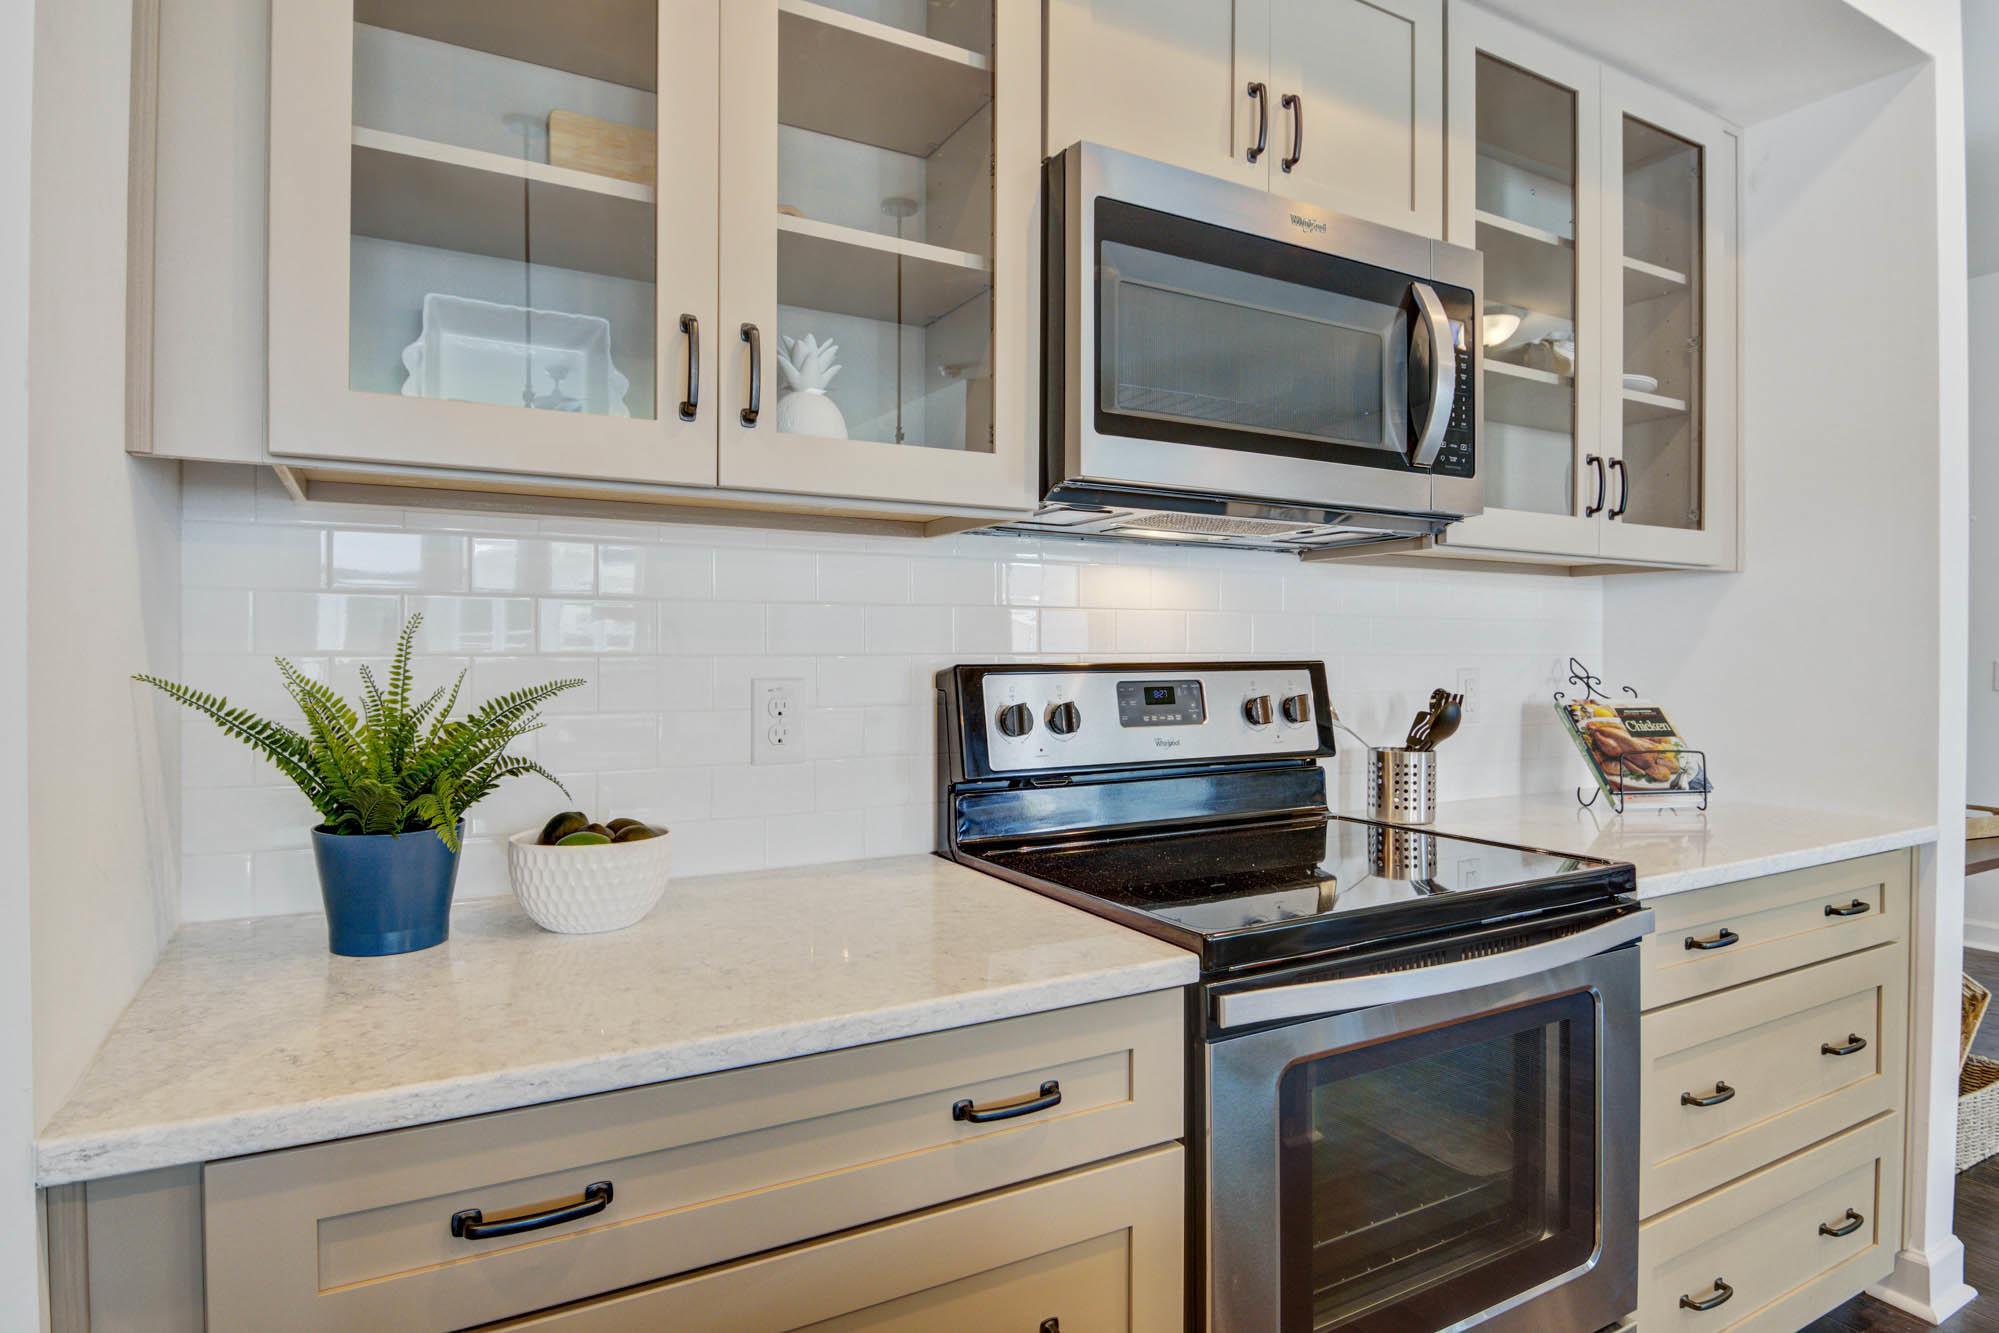 Marshview Commons Homes For Sale - 530 Mclernon, Johns Island, SC - 23